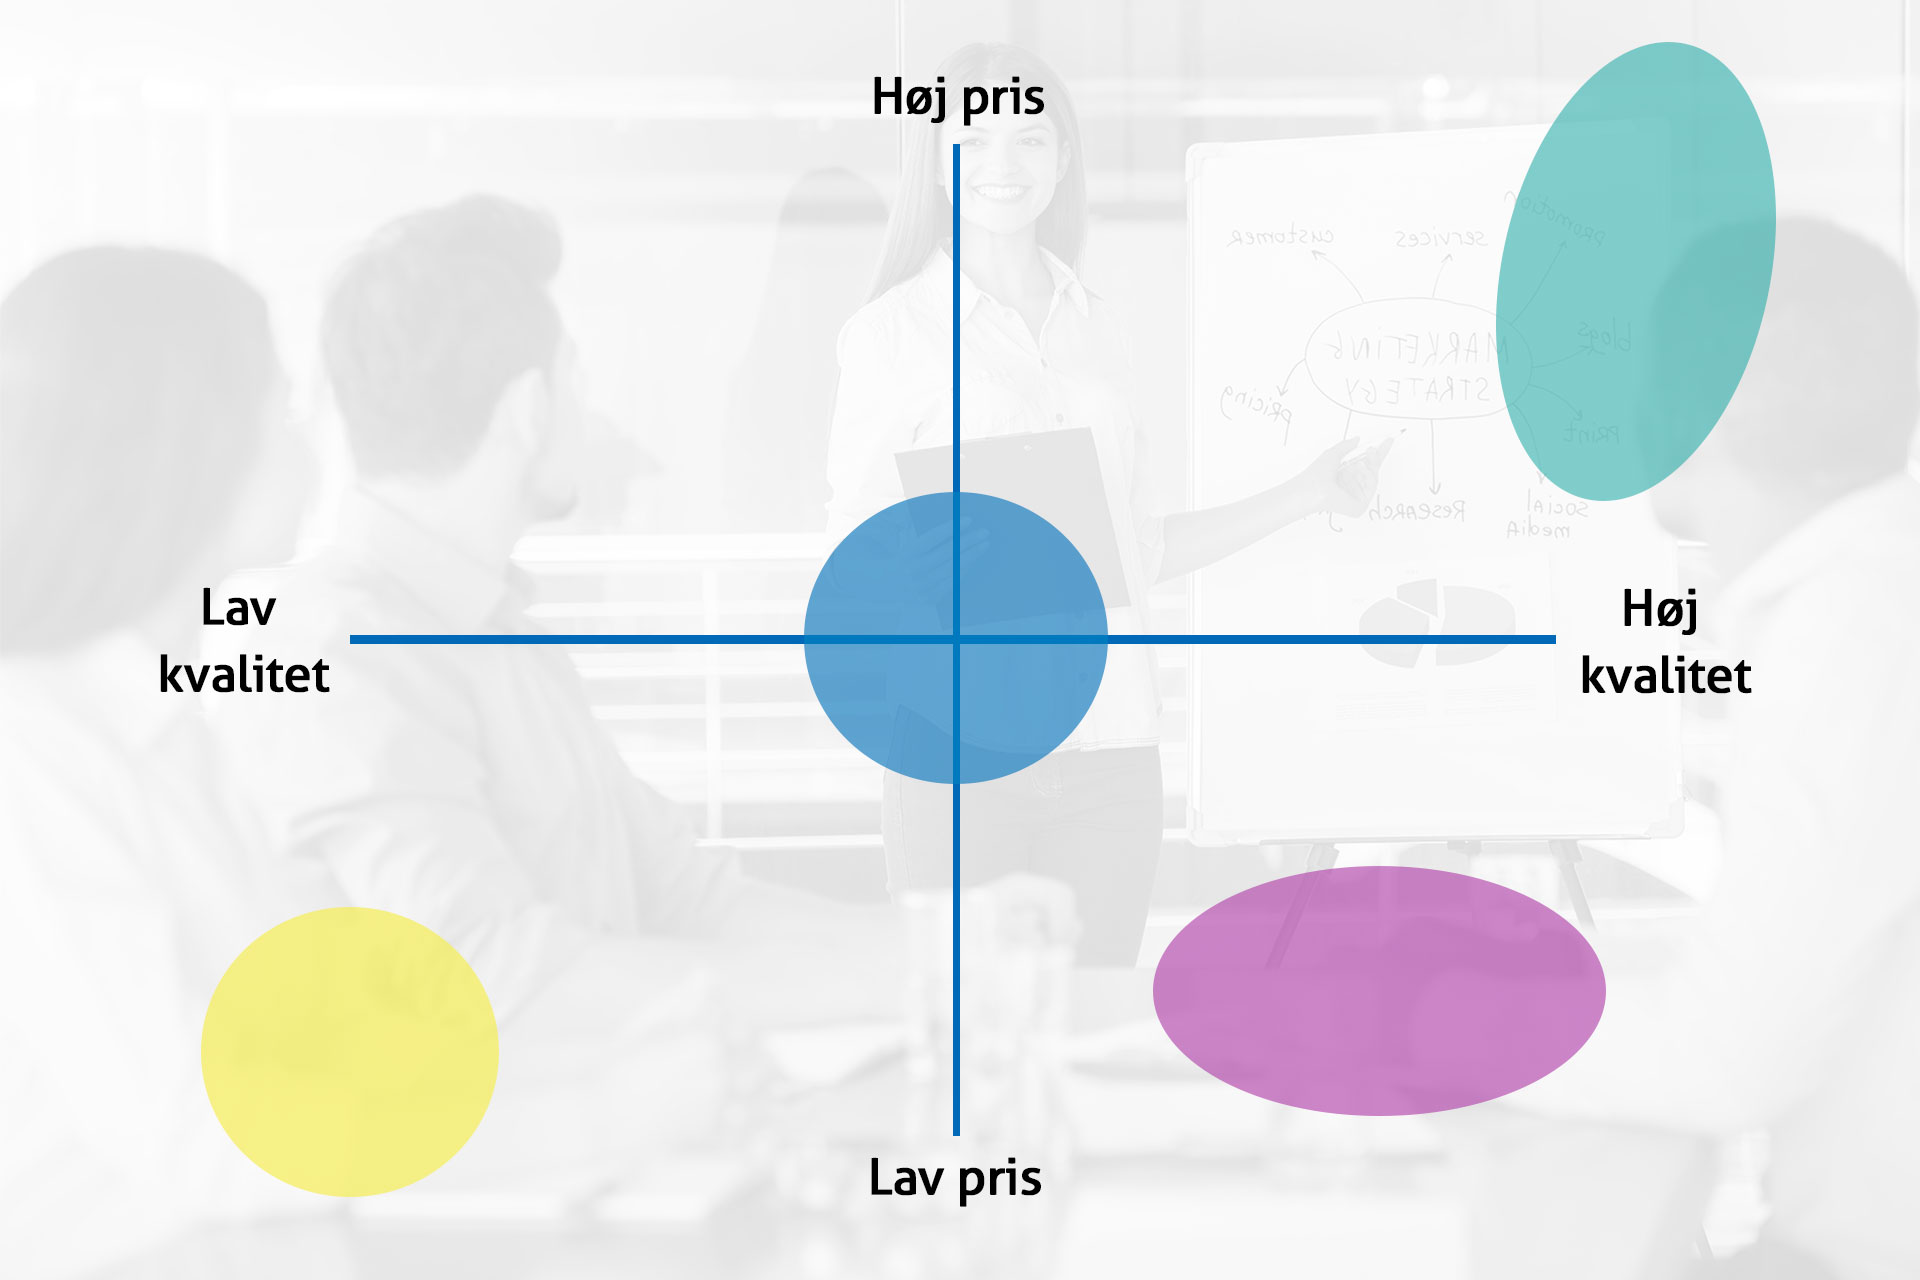 Marketing mix - pris-kvalitet strategi